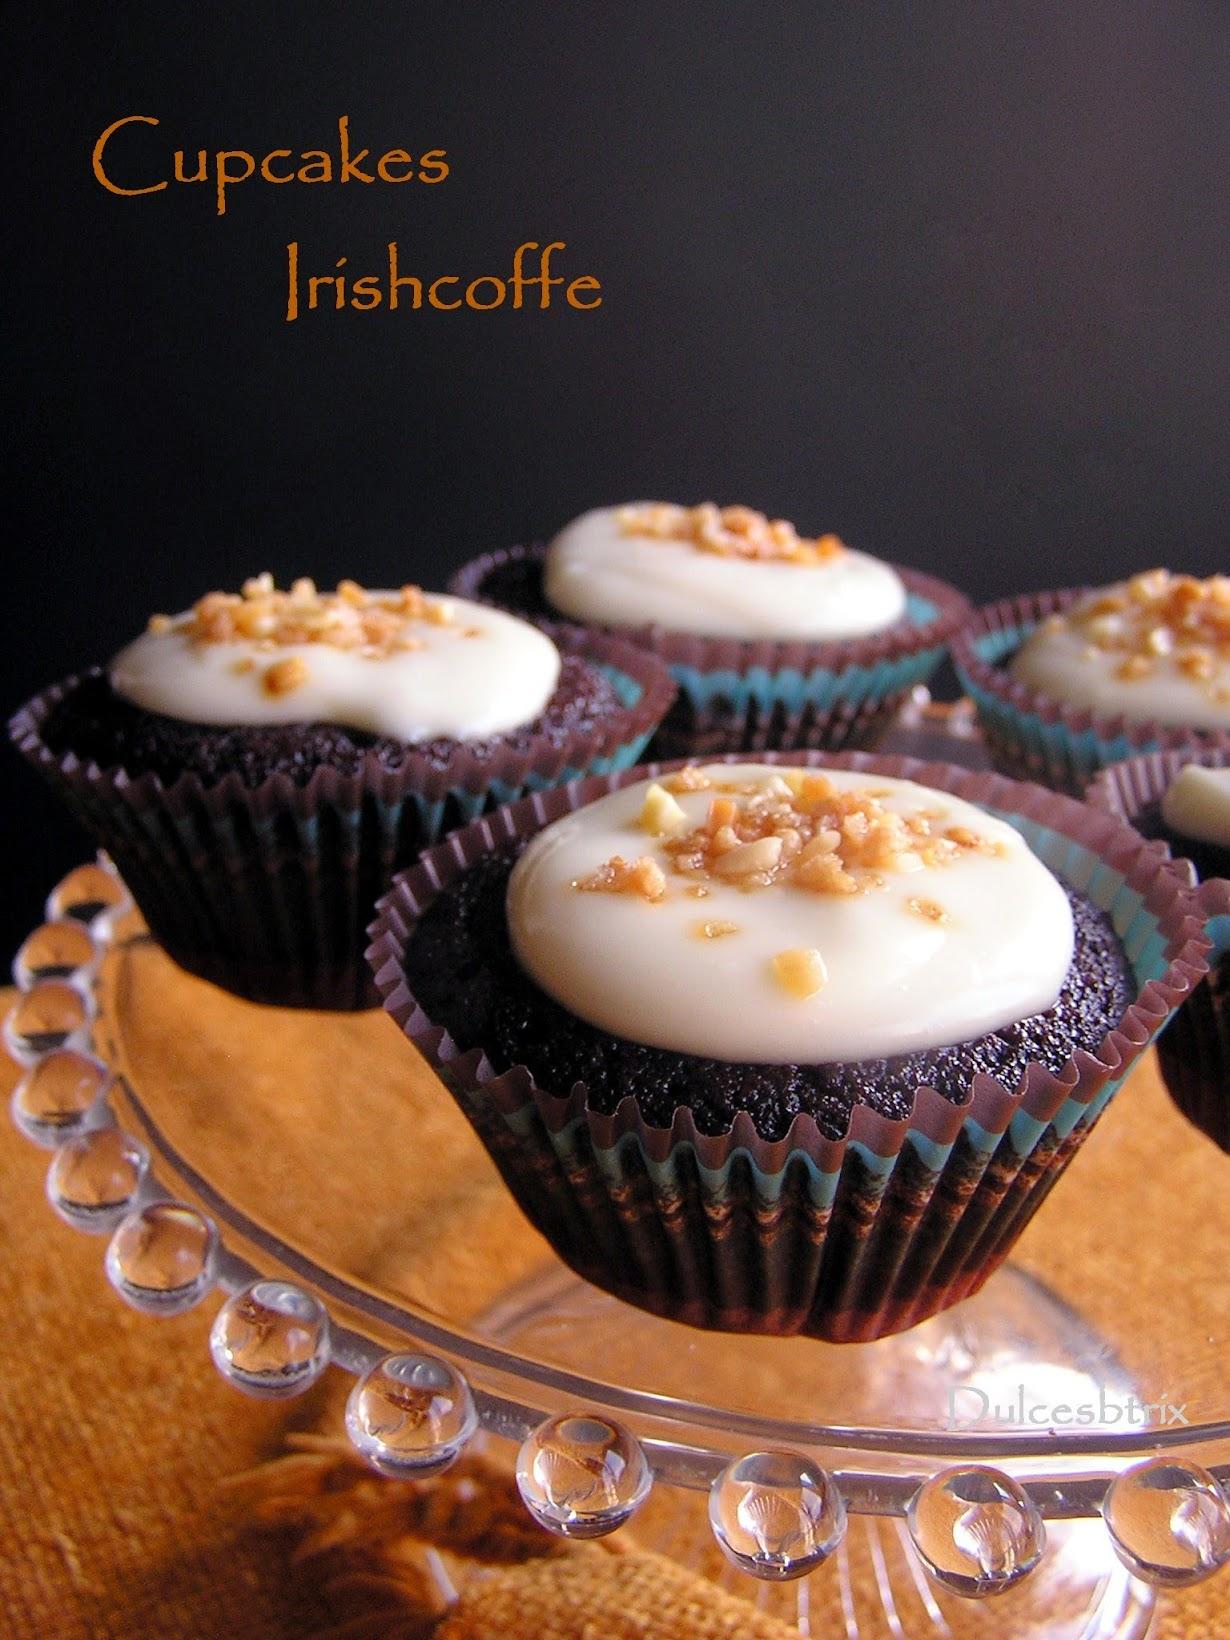 Cupcakes de café irlandes